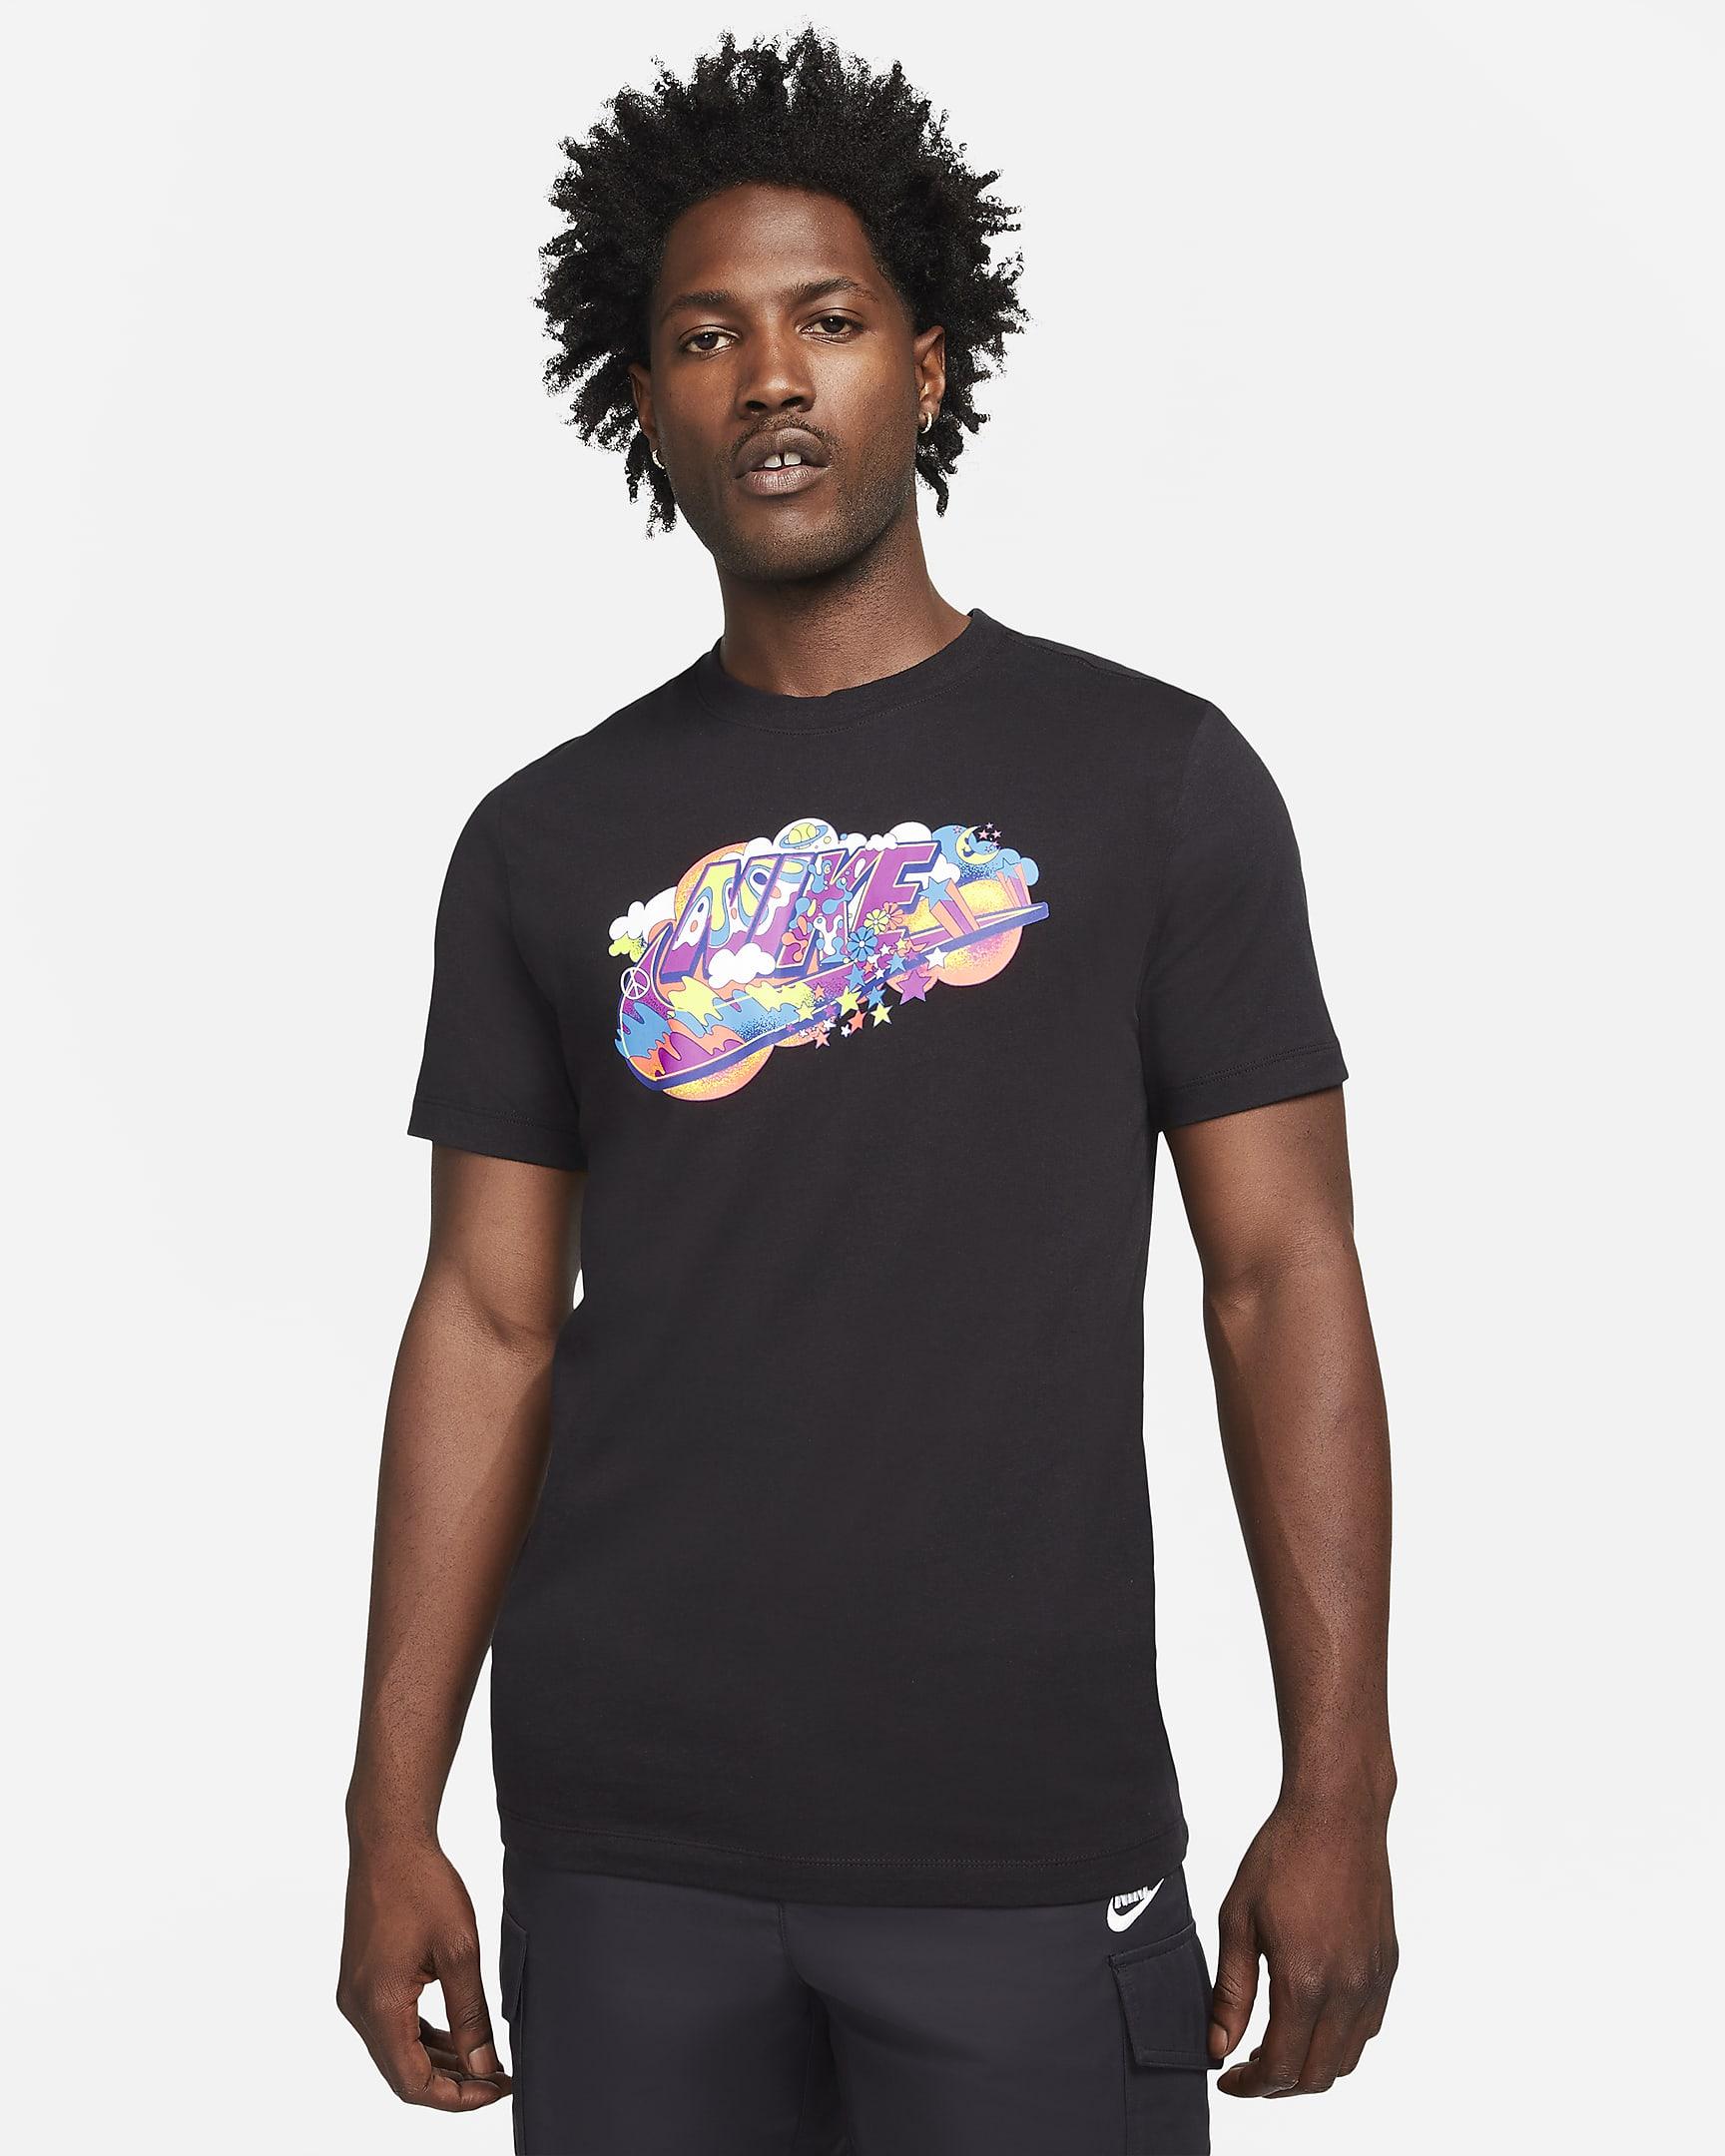 nike-sportswear-mens-black-light-t-shirt-wNmkGJ-4.png